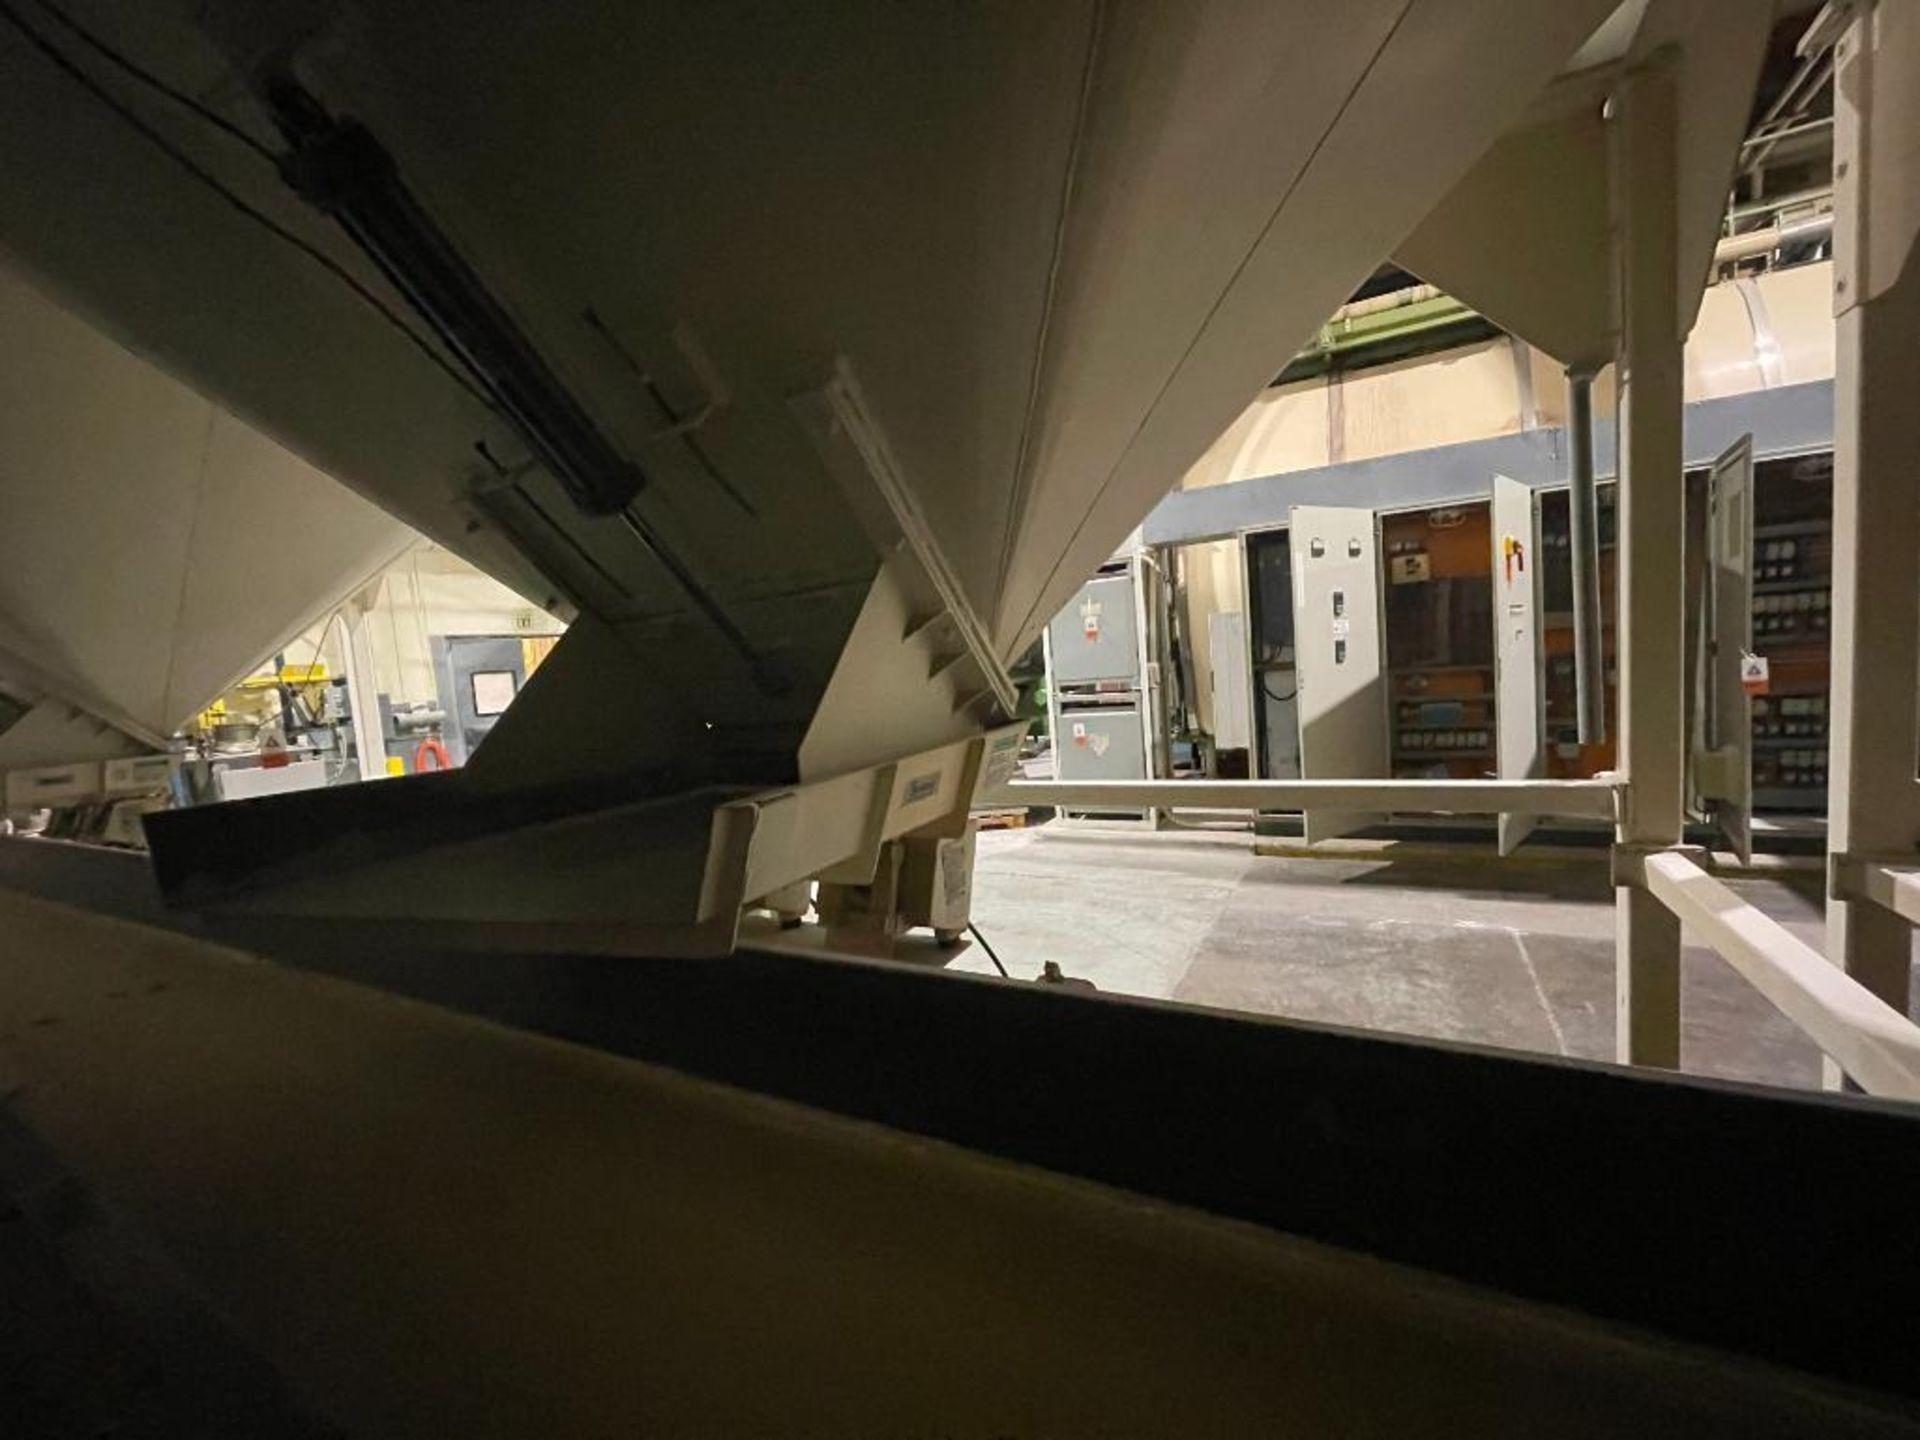 Aseeco mild steel cone bottom bulk storage bin - Image 20 of 31